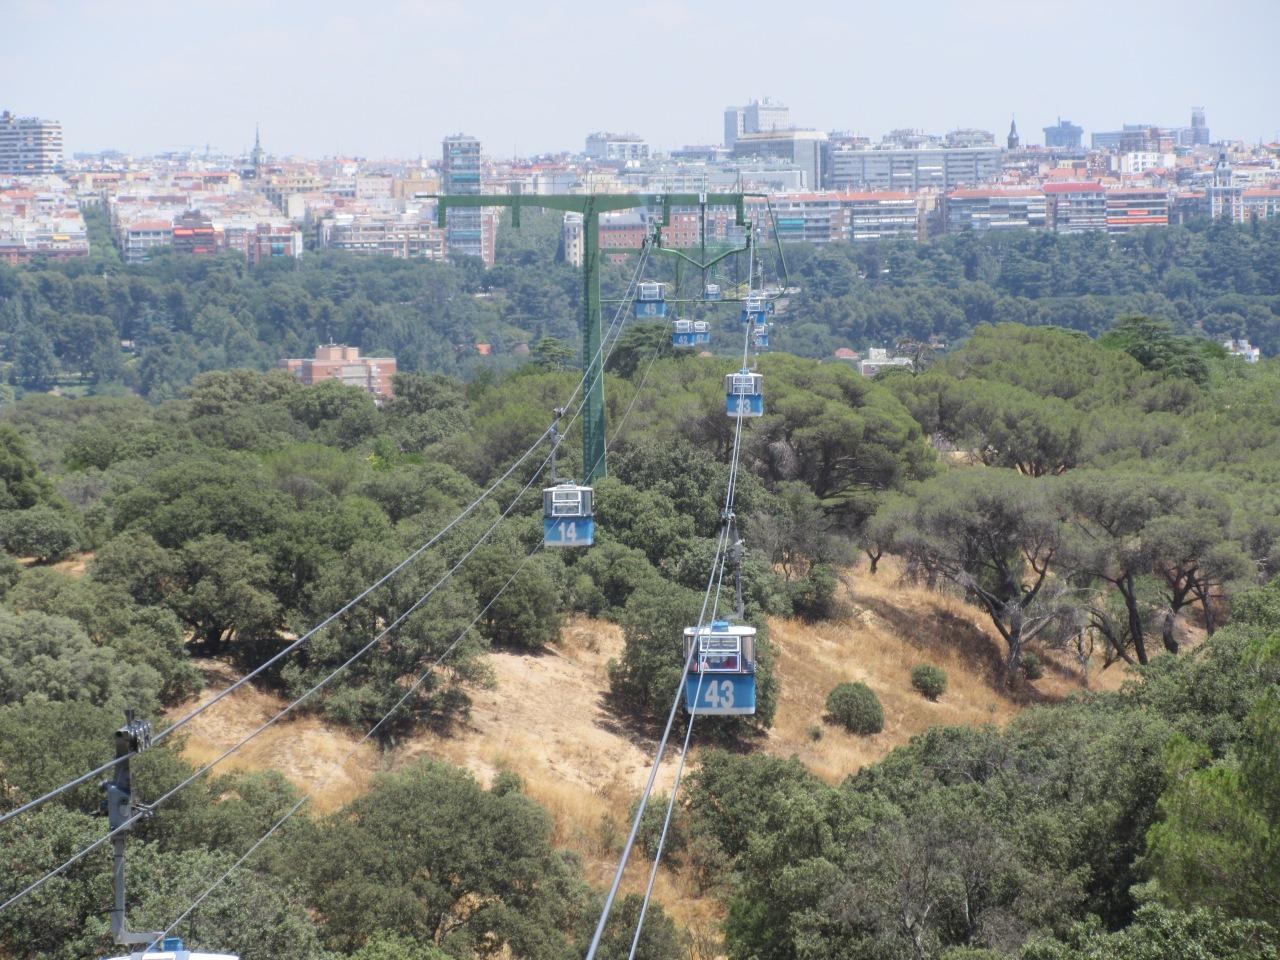 Quirky Madrid: The teleféricocable-car